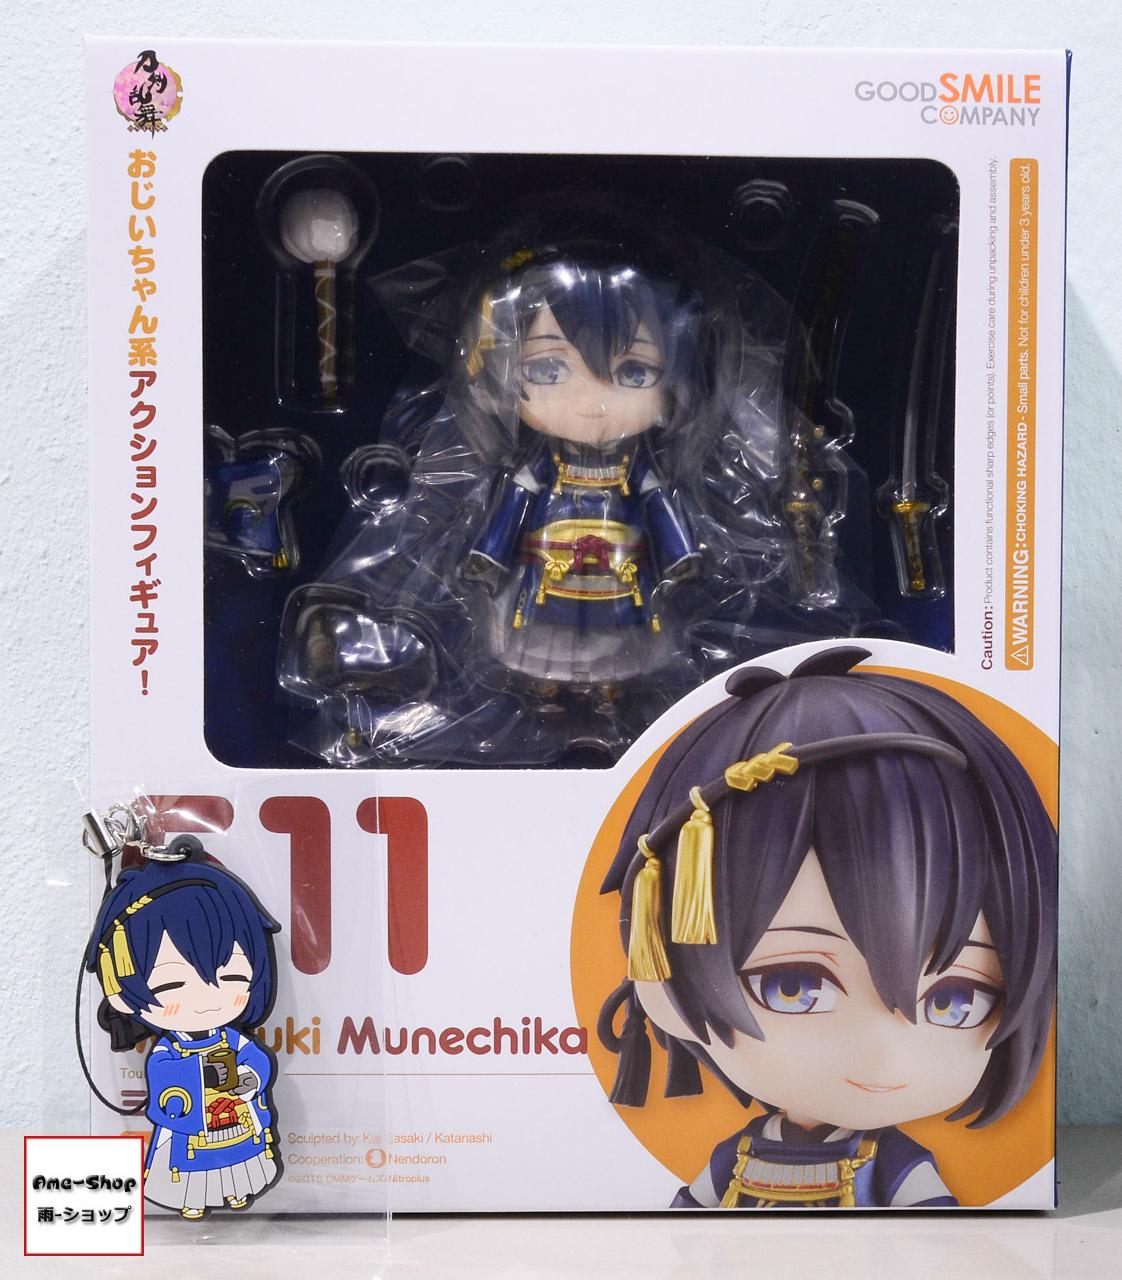 Nendoroid - Touken Ranbu Online: Mikazuki Munechika (Limited GOOD SMILE ONLINE SHOP Bonus)